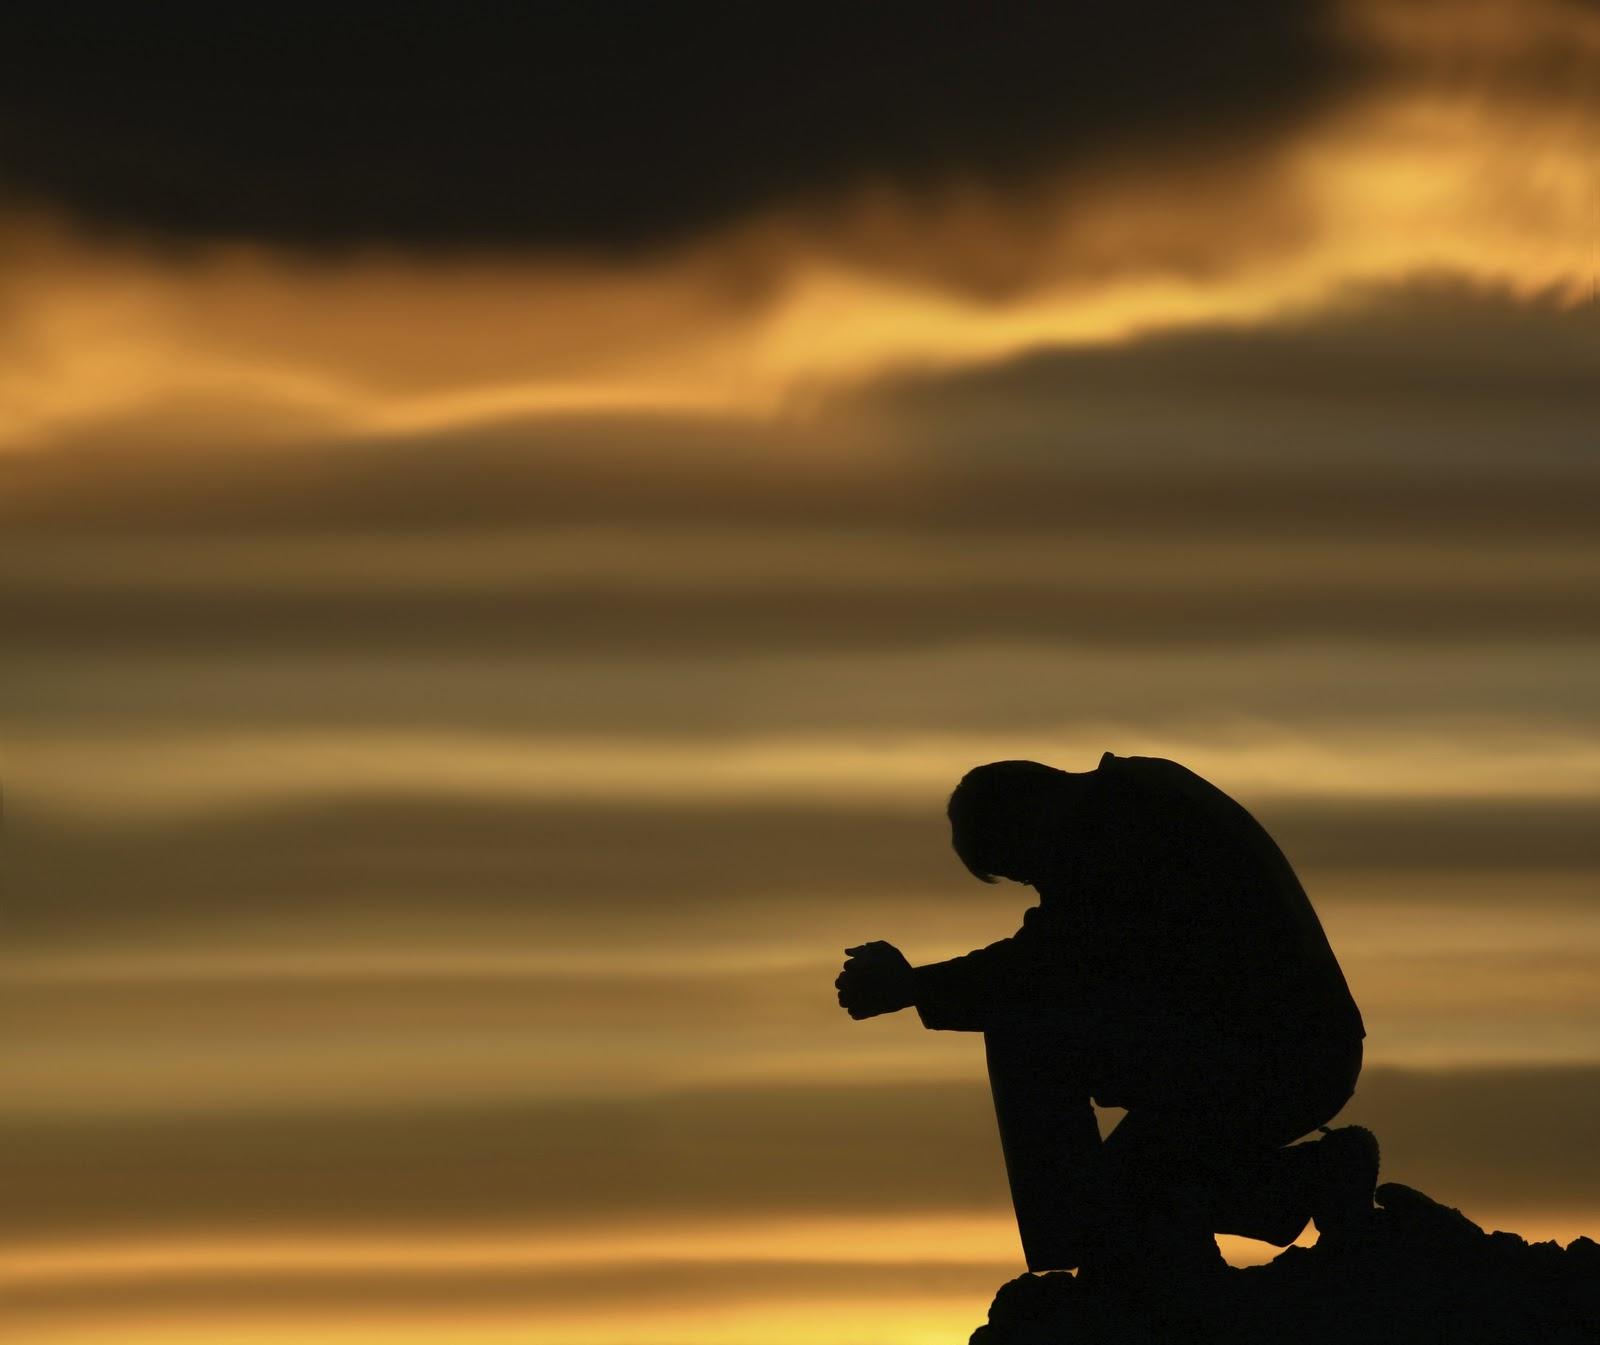 Heart Touching Sad Boy Wallpaper Alone Boy Sad Images 1600x1345